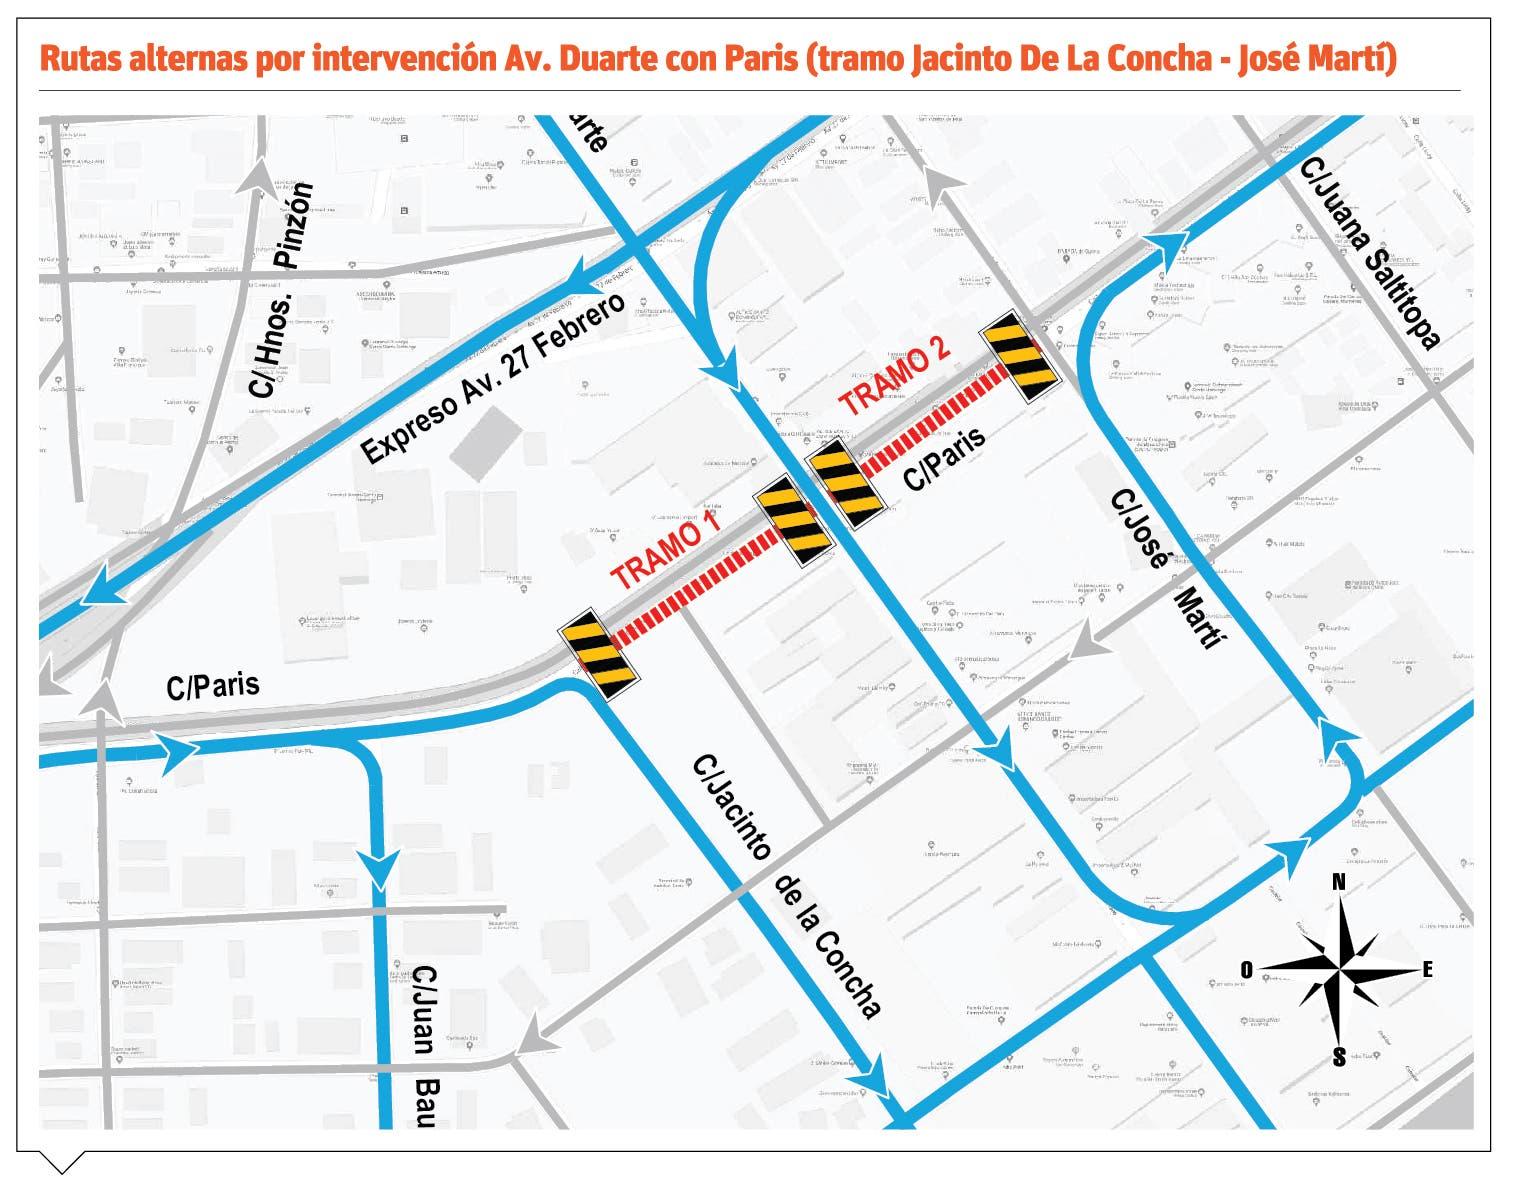 Patrón vial Duarte con París esta listo para inicio proyecto